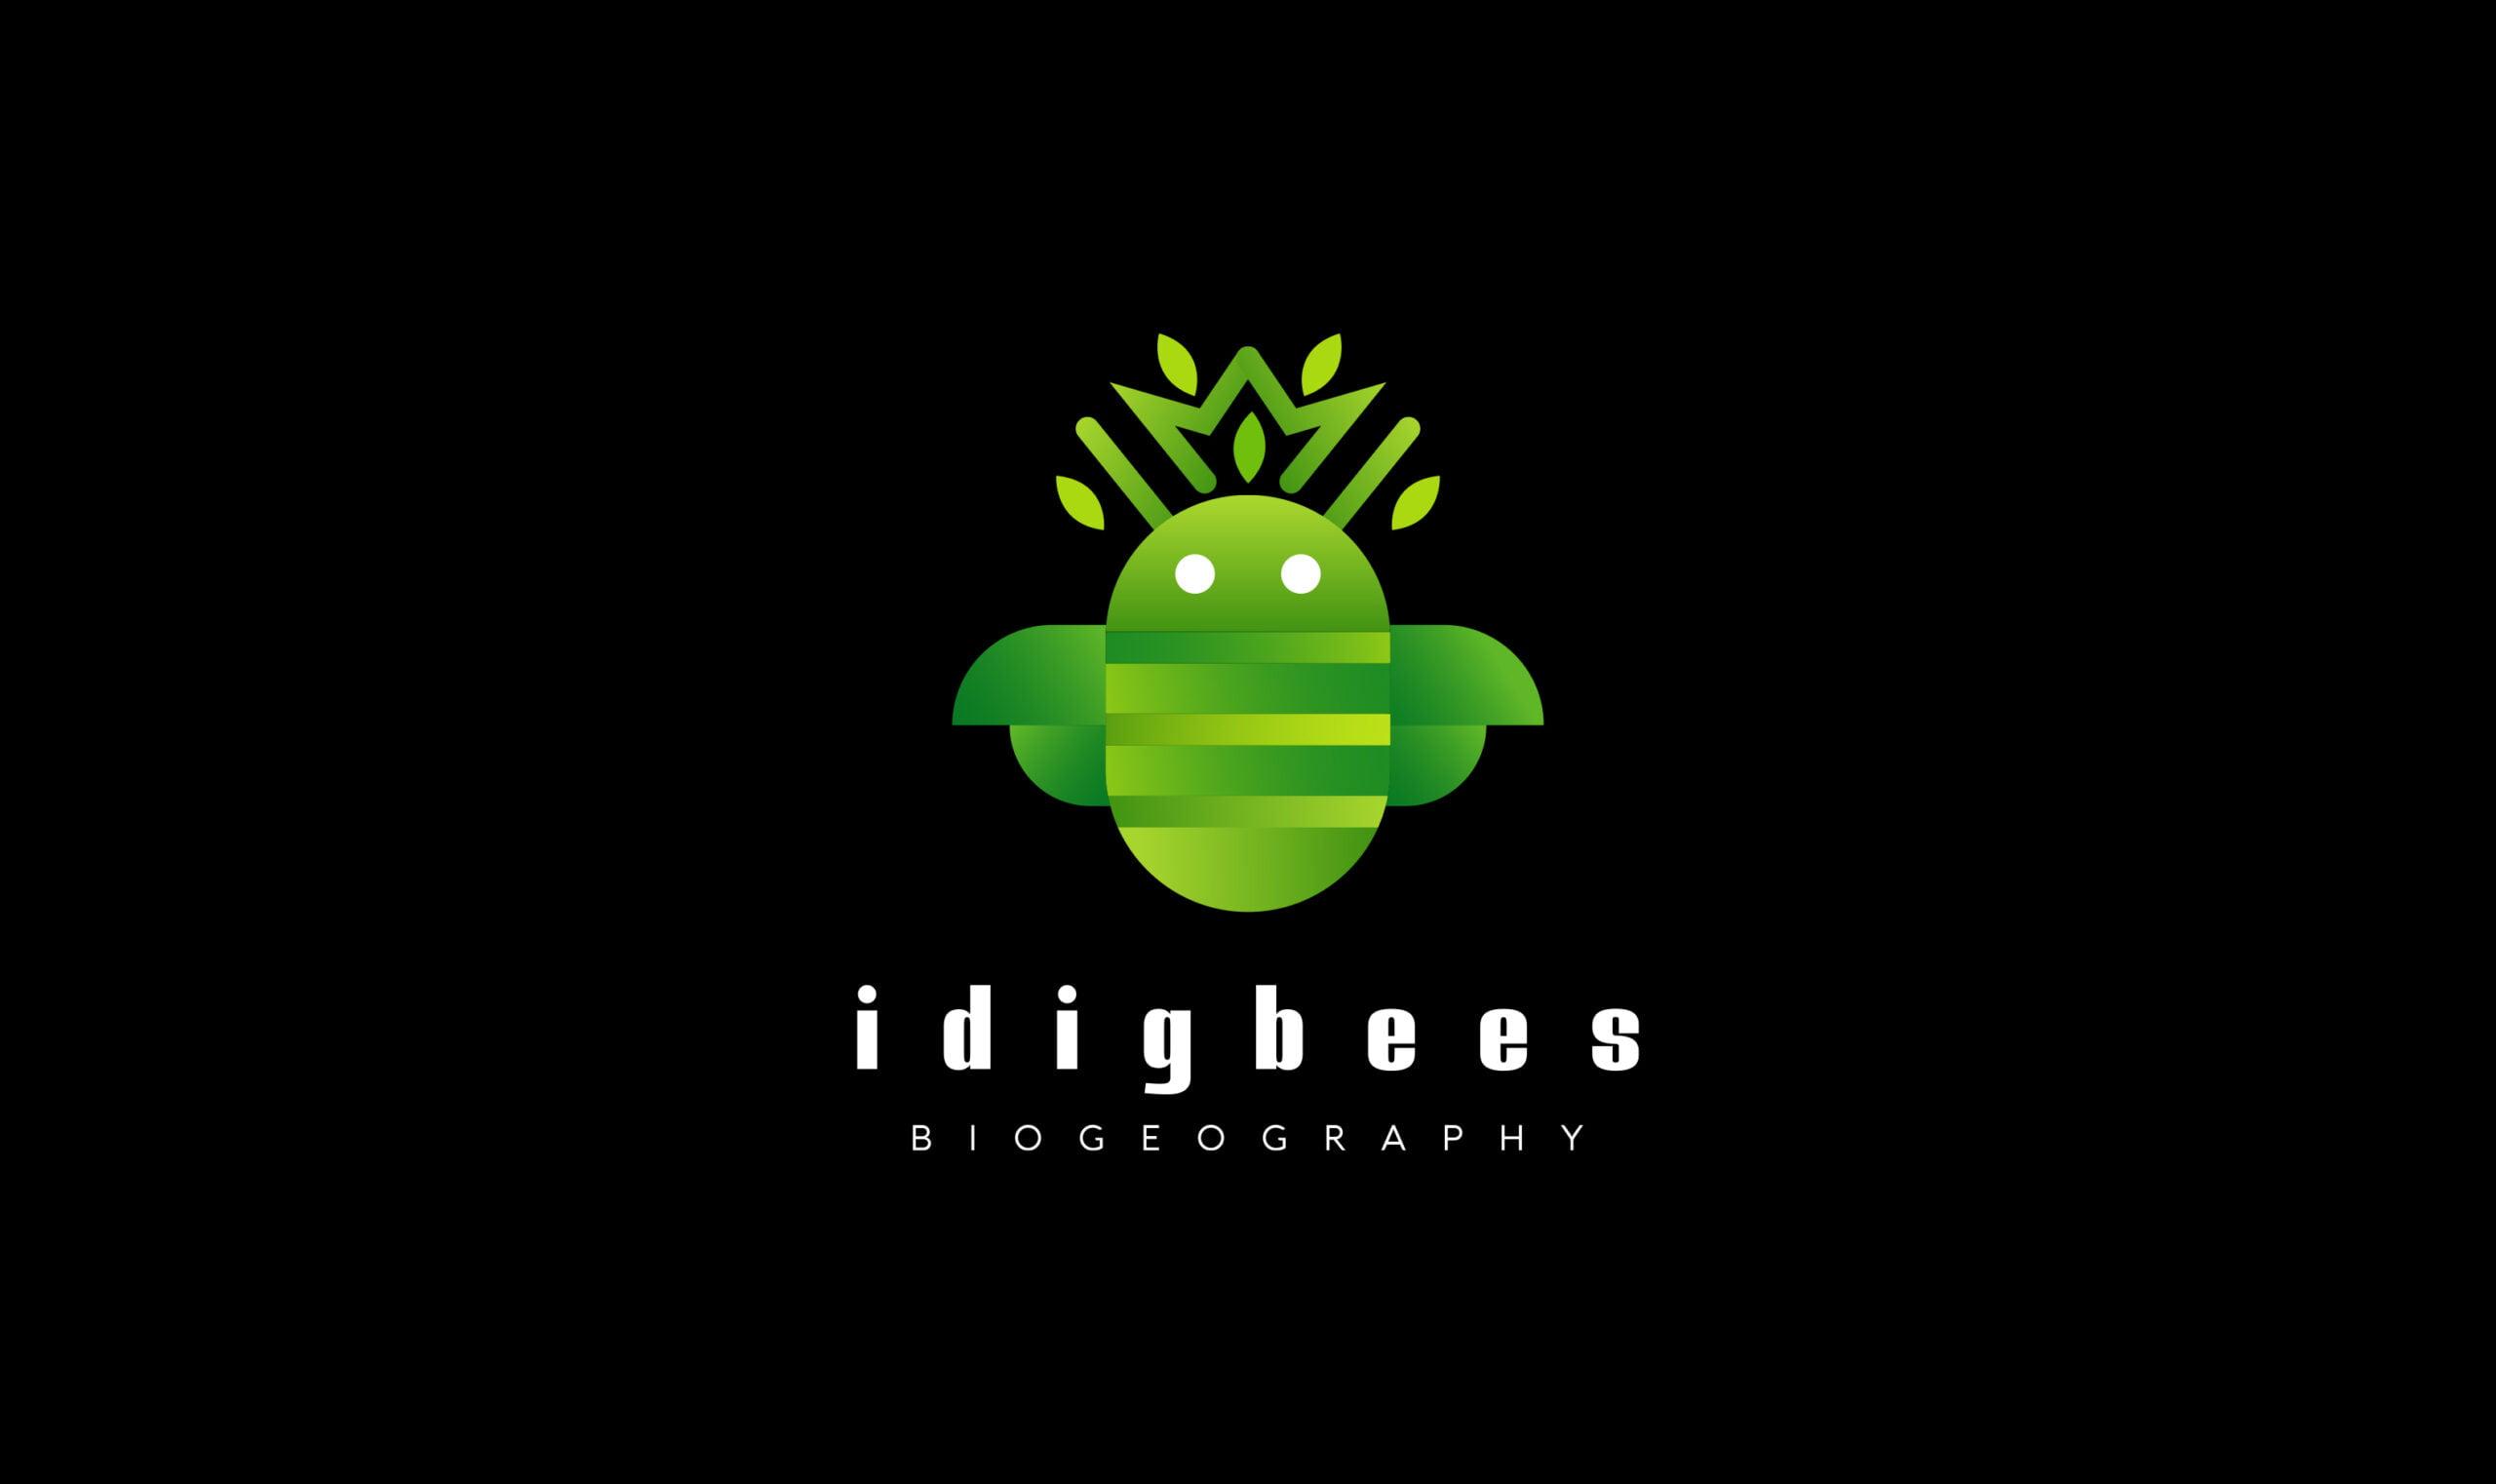 I will do 2 modern flat minimalist logo design, FiverrBox